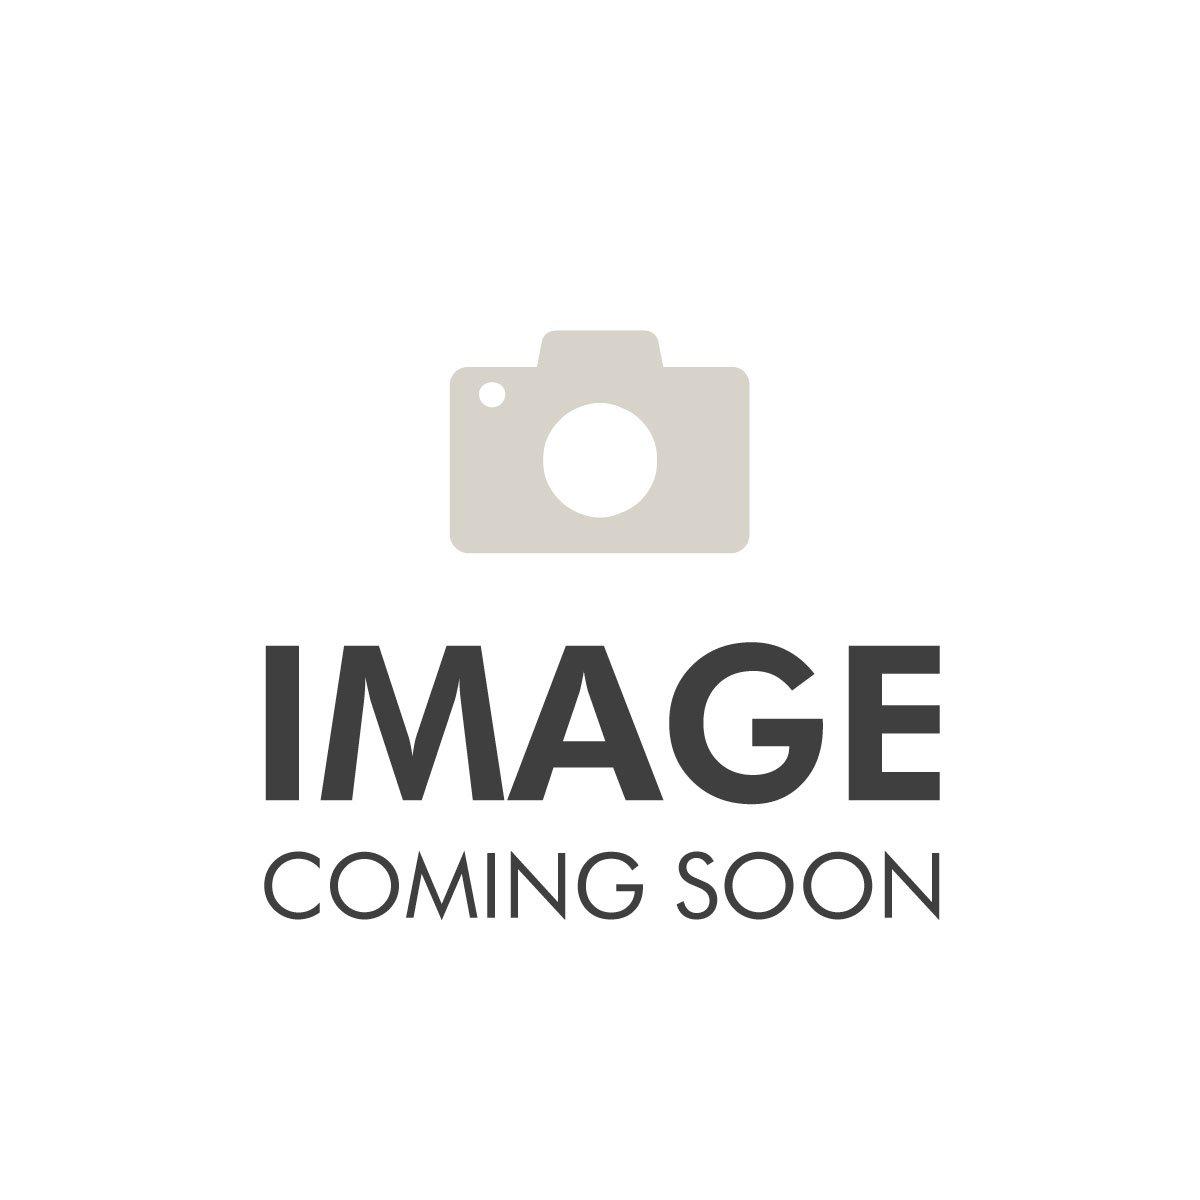 Elizabeth Arden Sunflowers 100ml EDT Spray / 100ml Body Lotion / 100ml Body Cleansing Cream